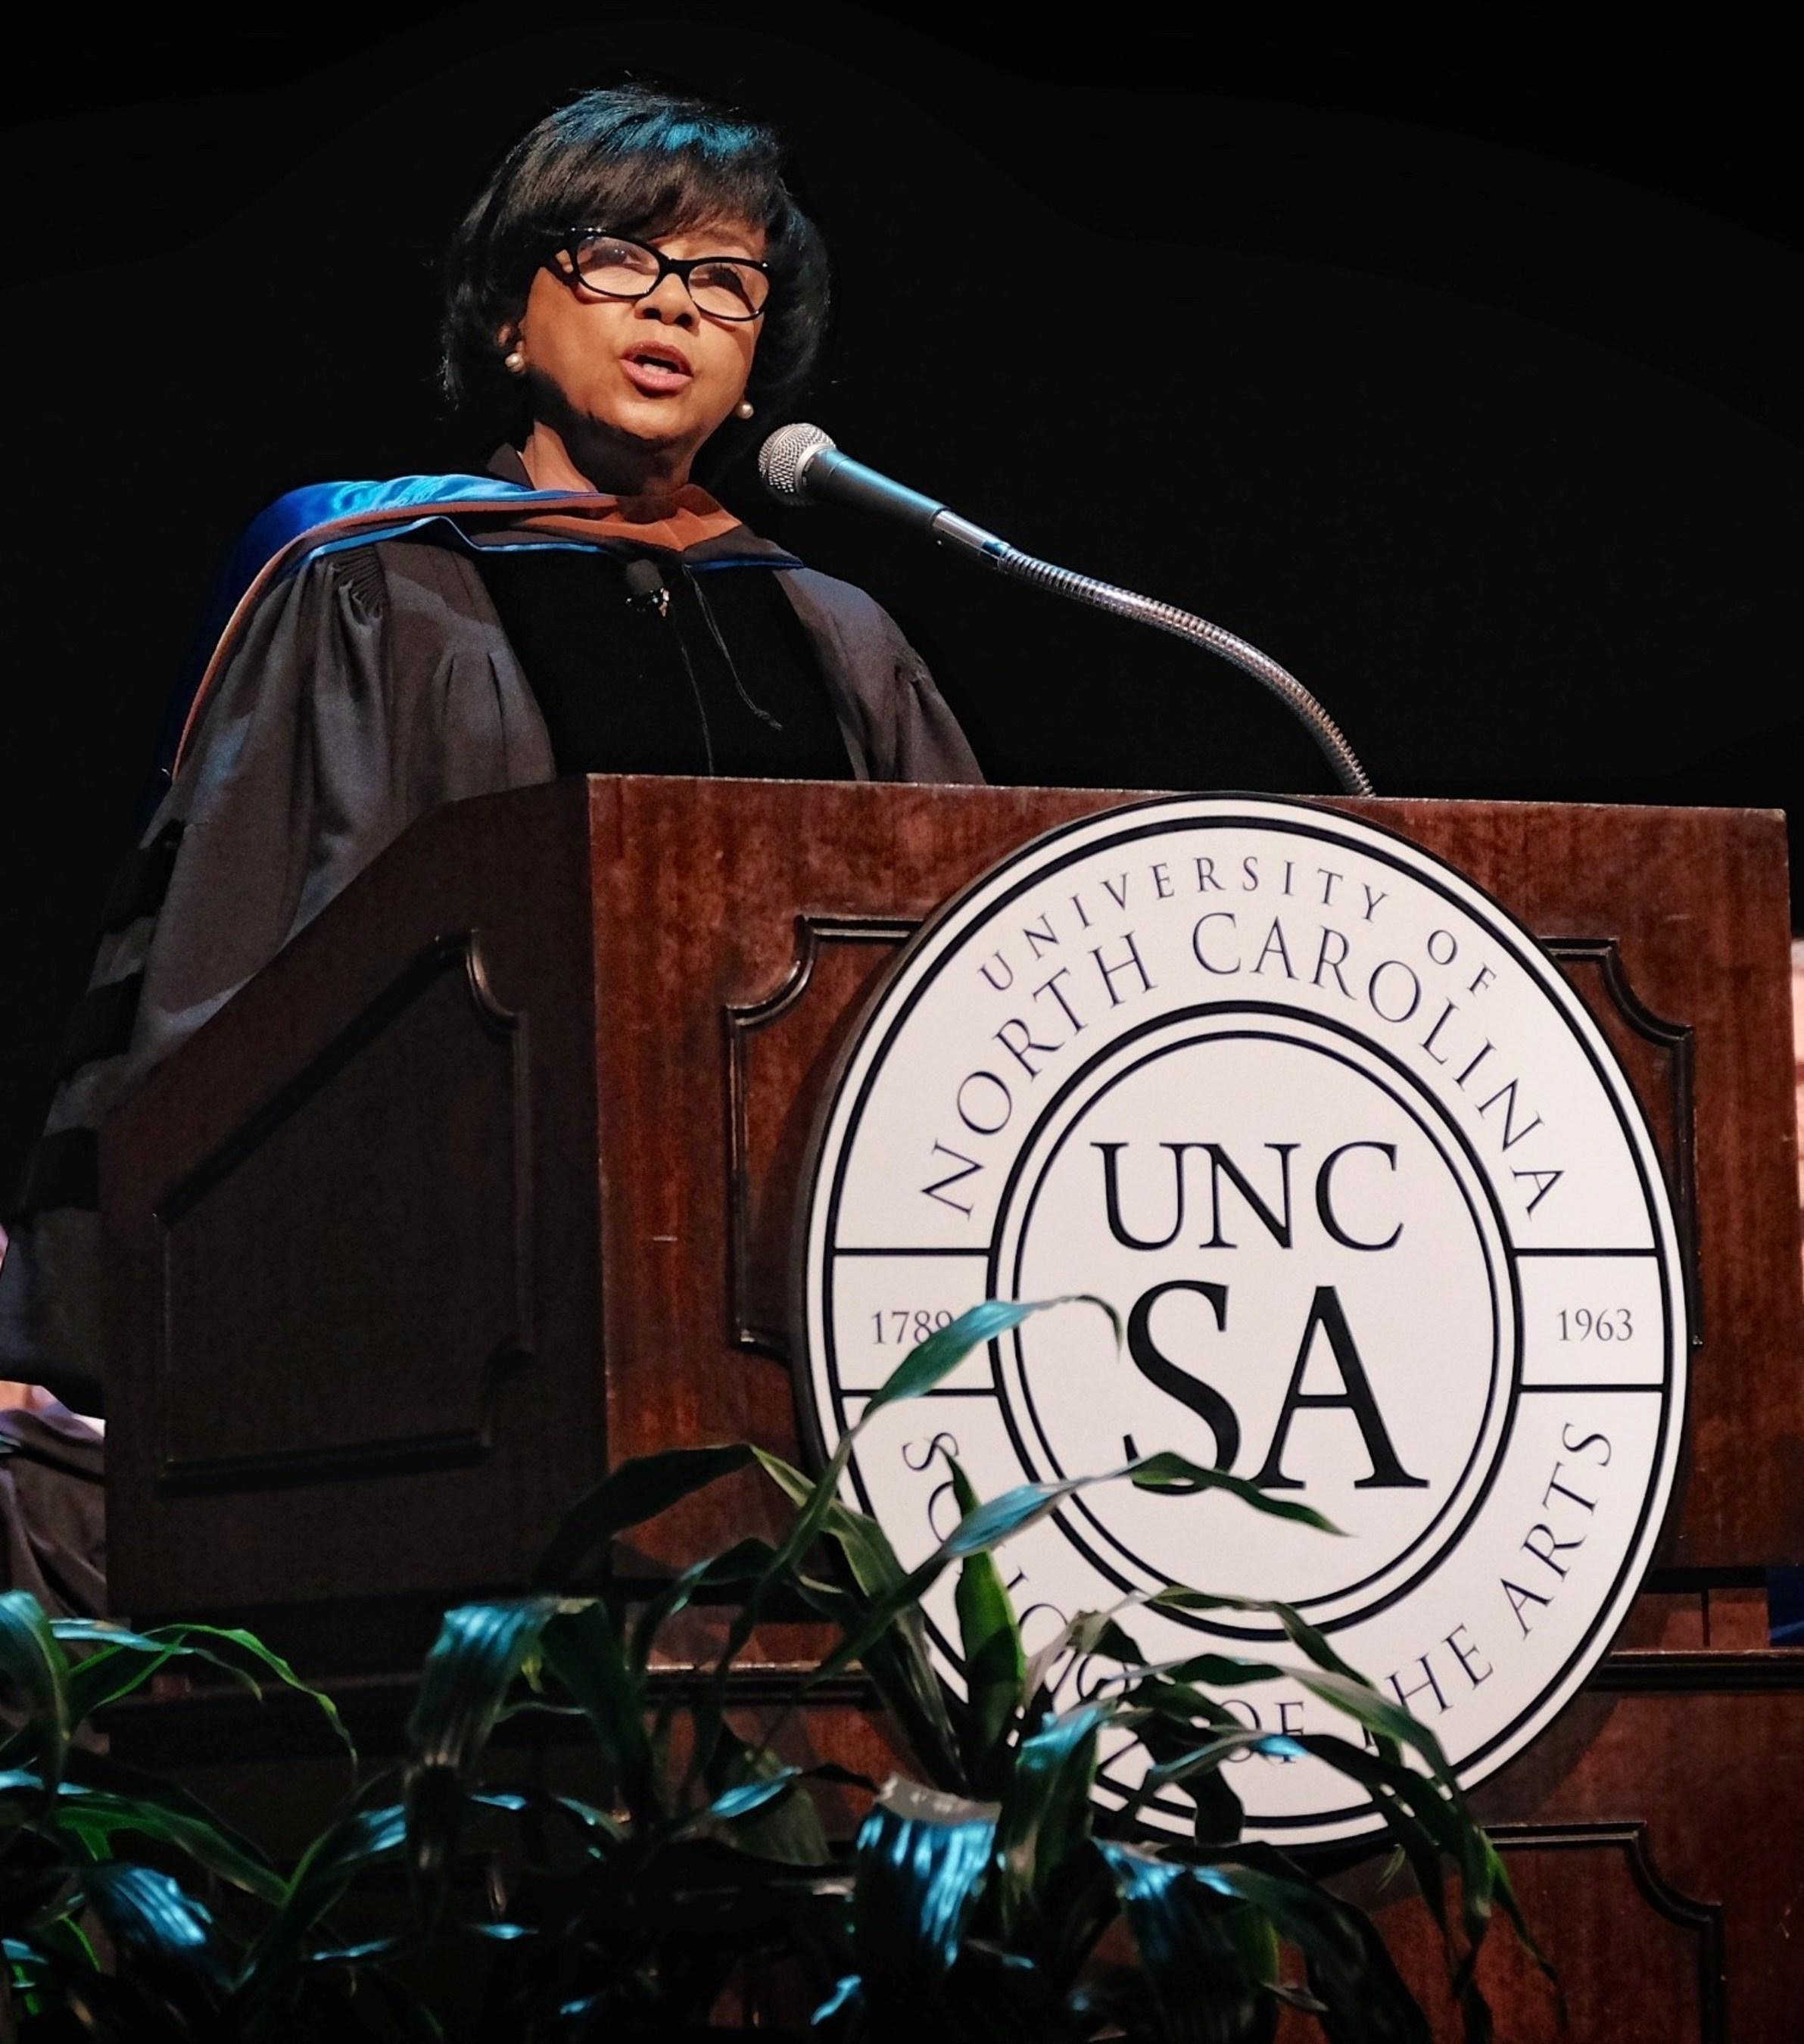 Cheryl Boone Isaacs addressed 235 graduates of the University of North Carolina School of the Arts in Winston-Salem on May 9.